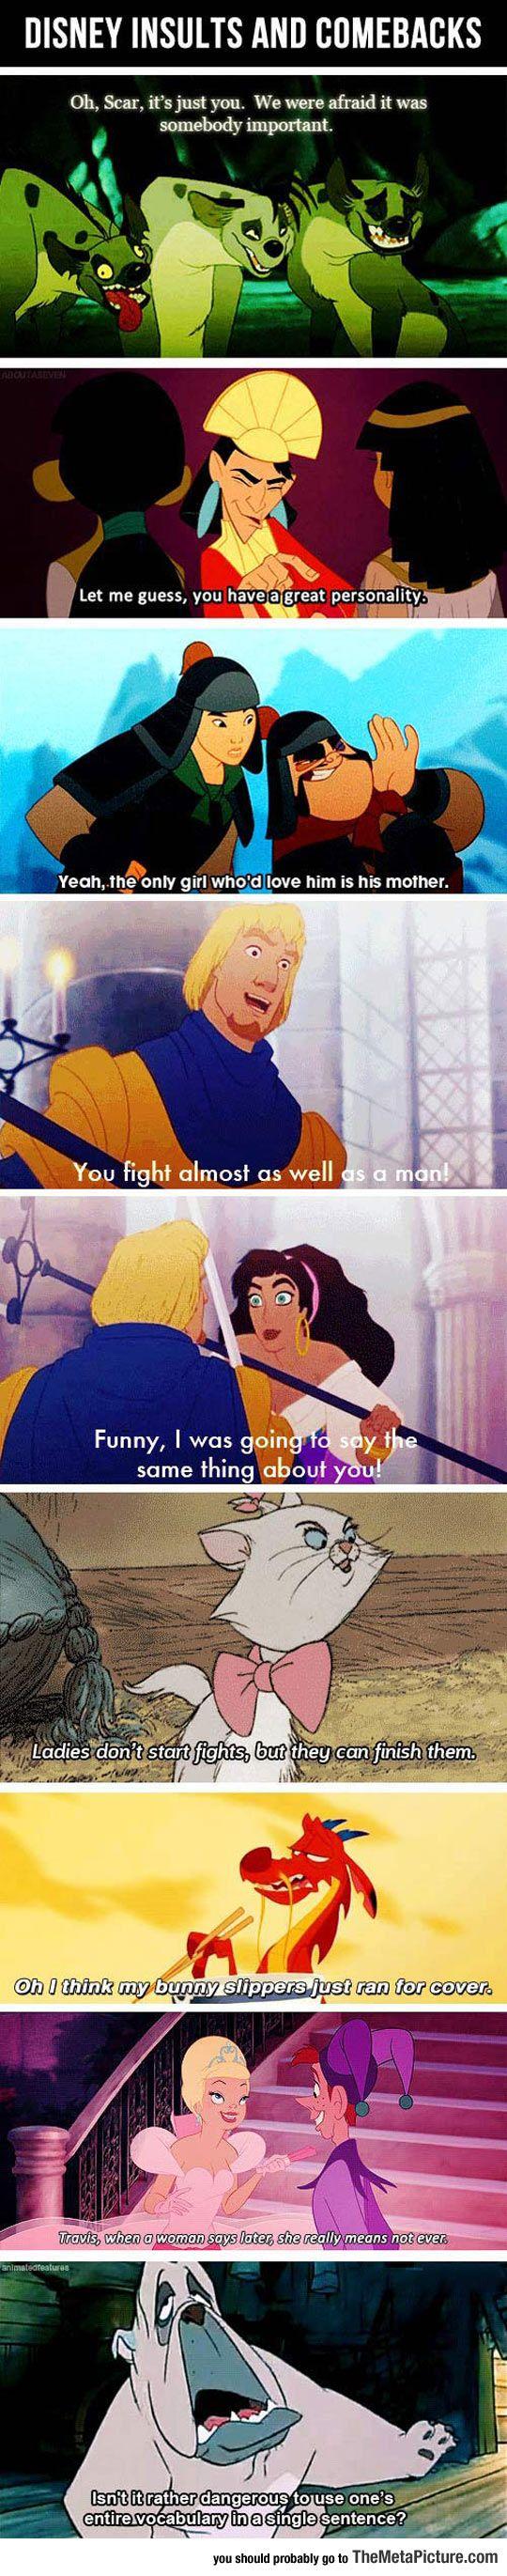 Best And Wittiest Disney Comebacks